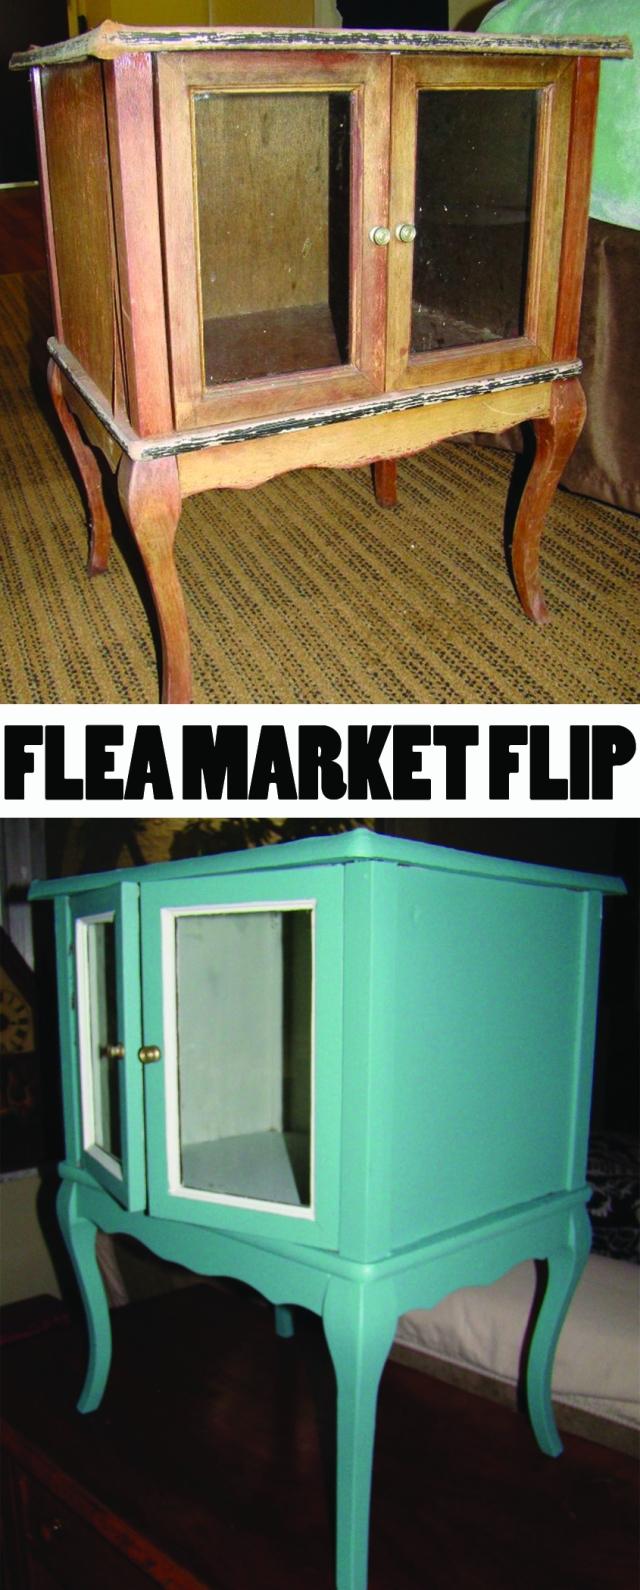 Flea Market Flip 01